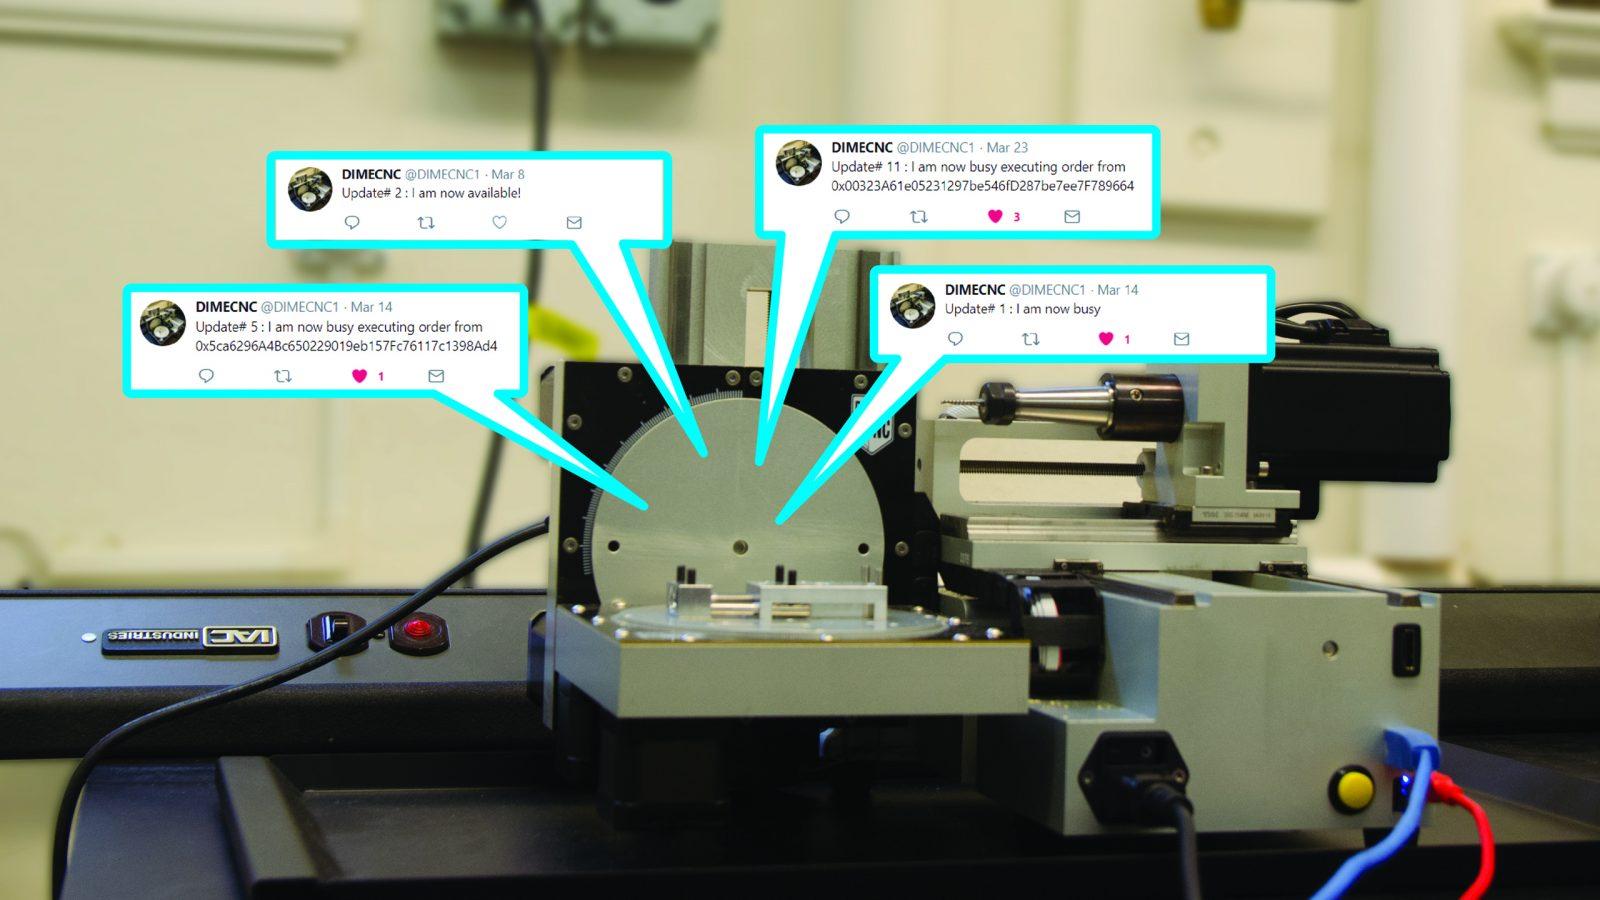 CNC Machine tweets to show its status